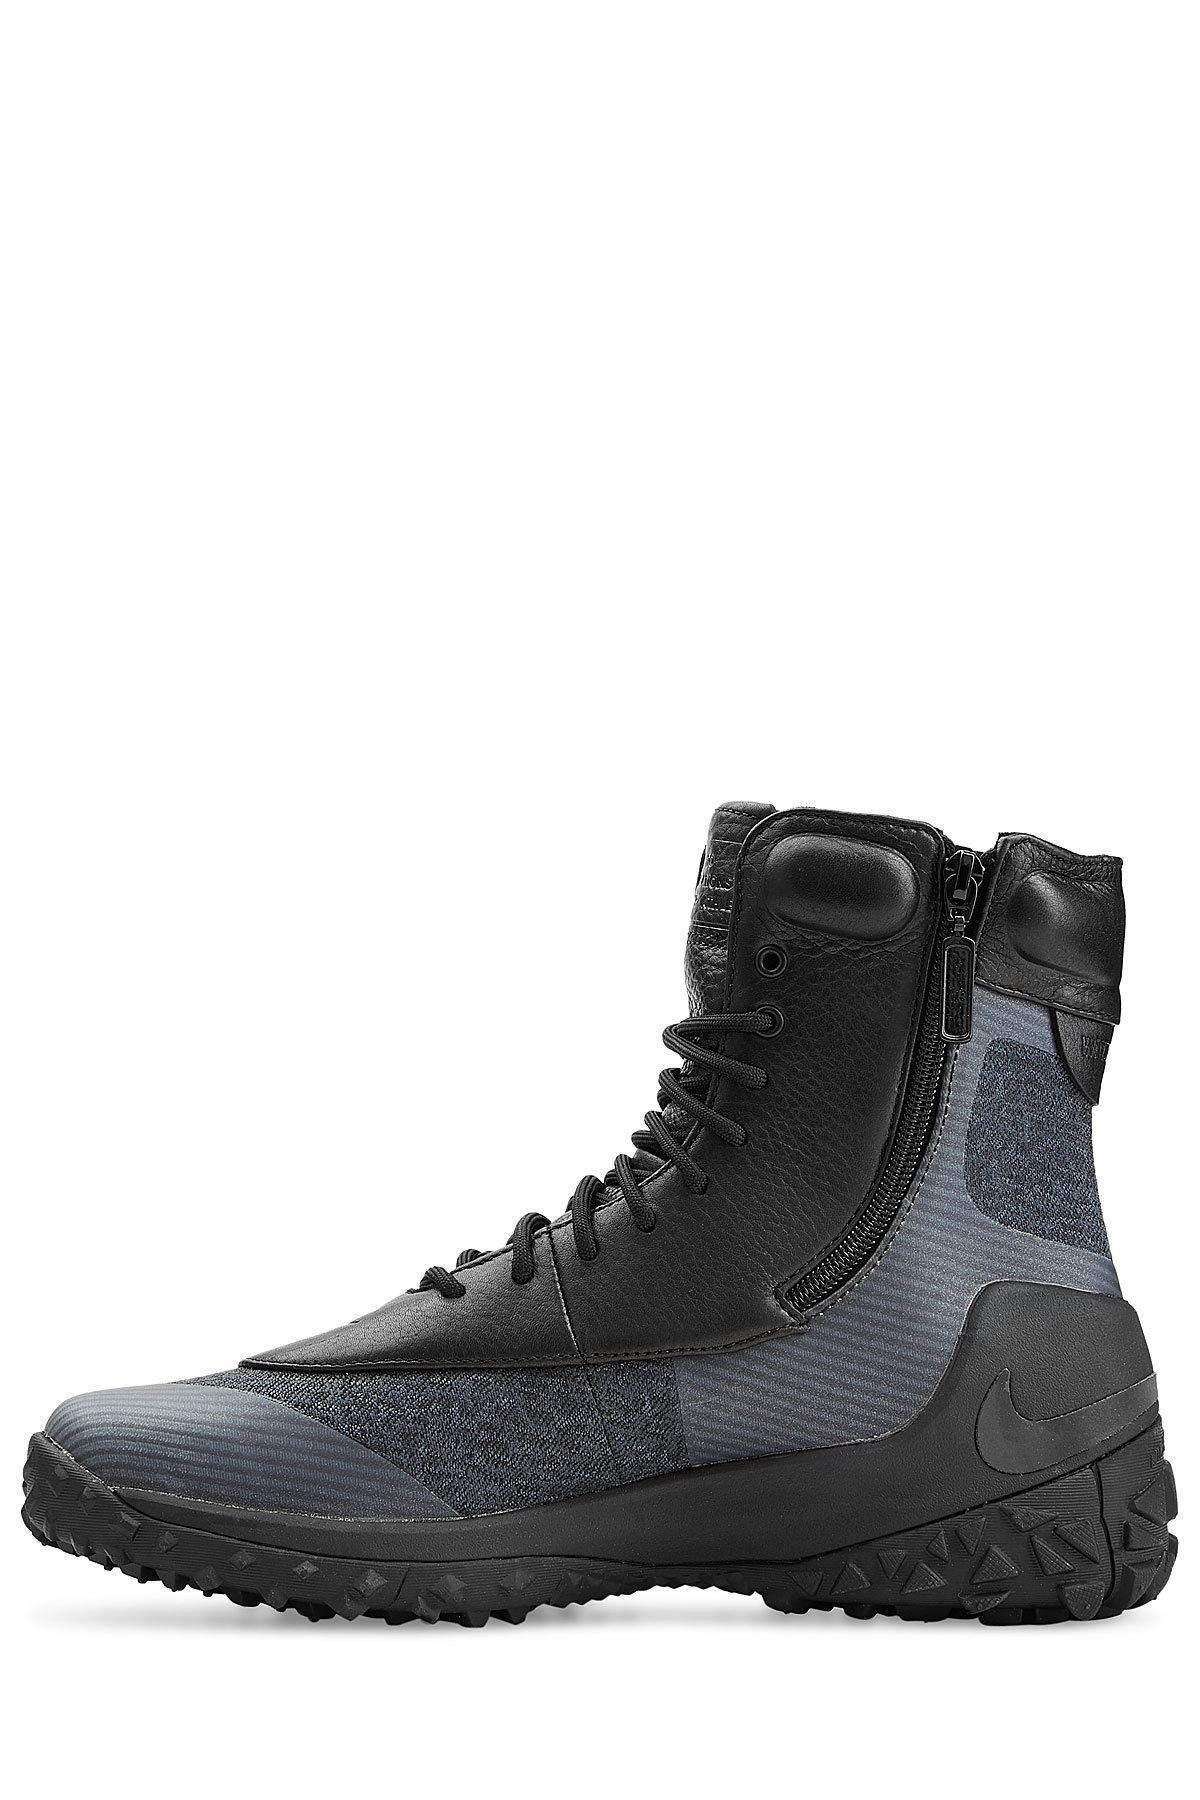 Nike Zoom Kynsi Jacquard Waterproof Boots in Black for Men ...